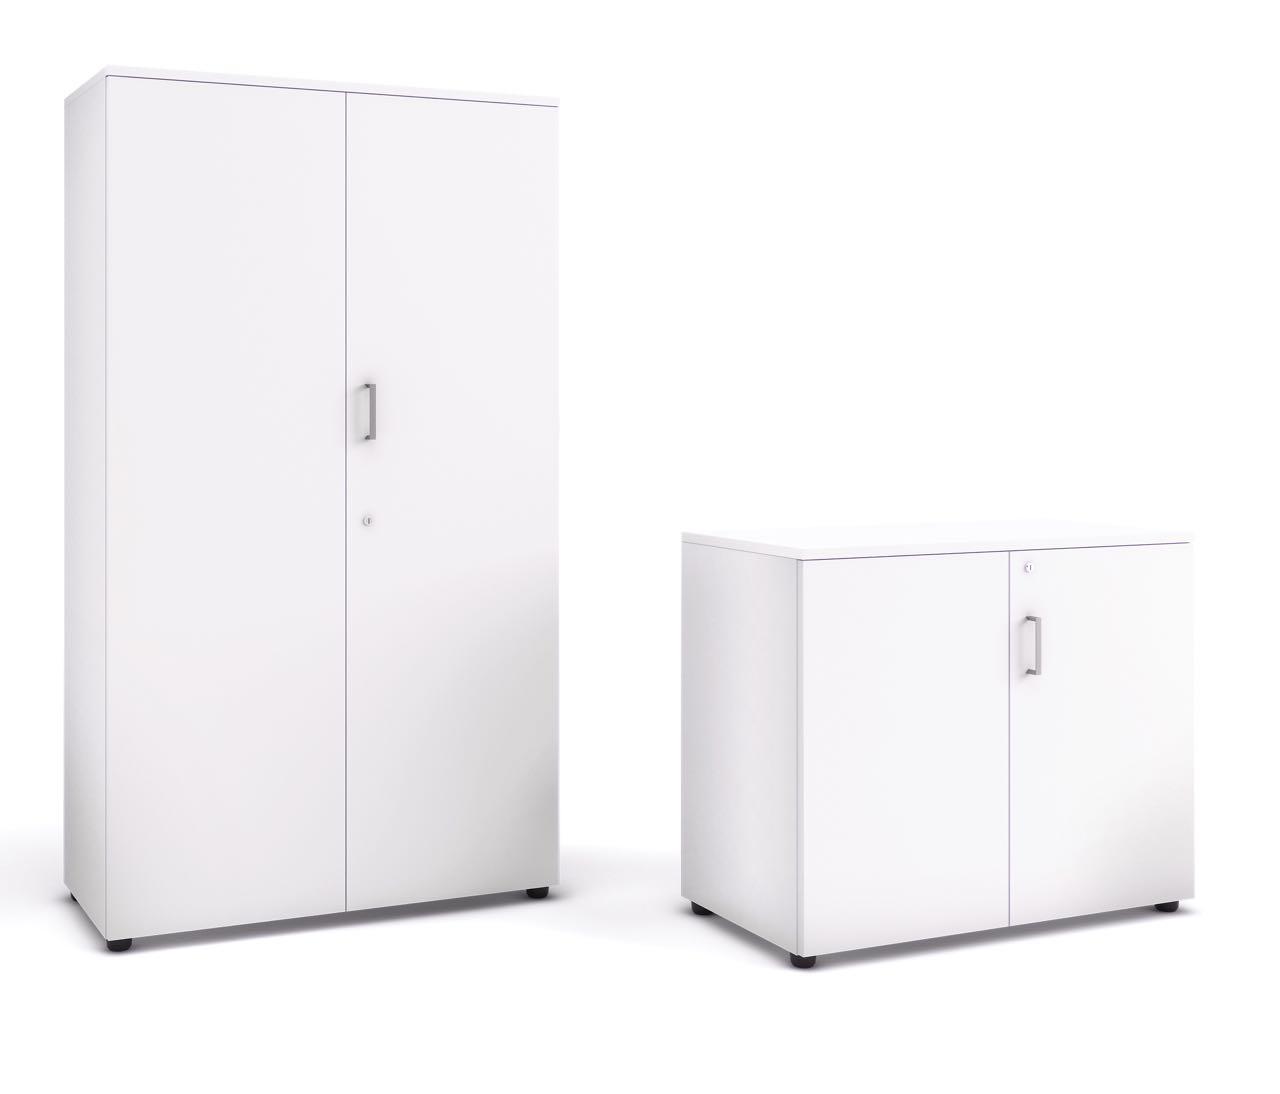 cube-armario-016.jpg